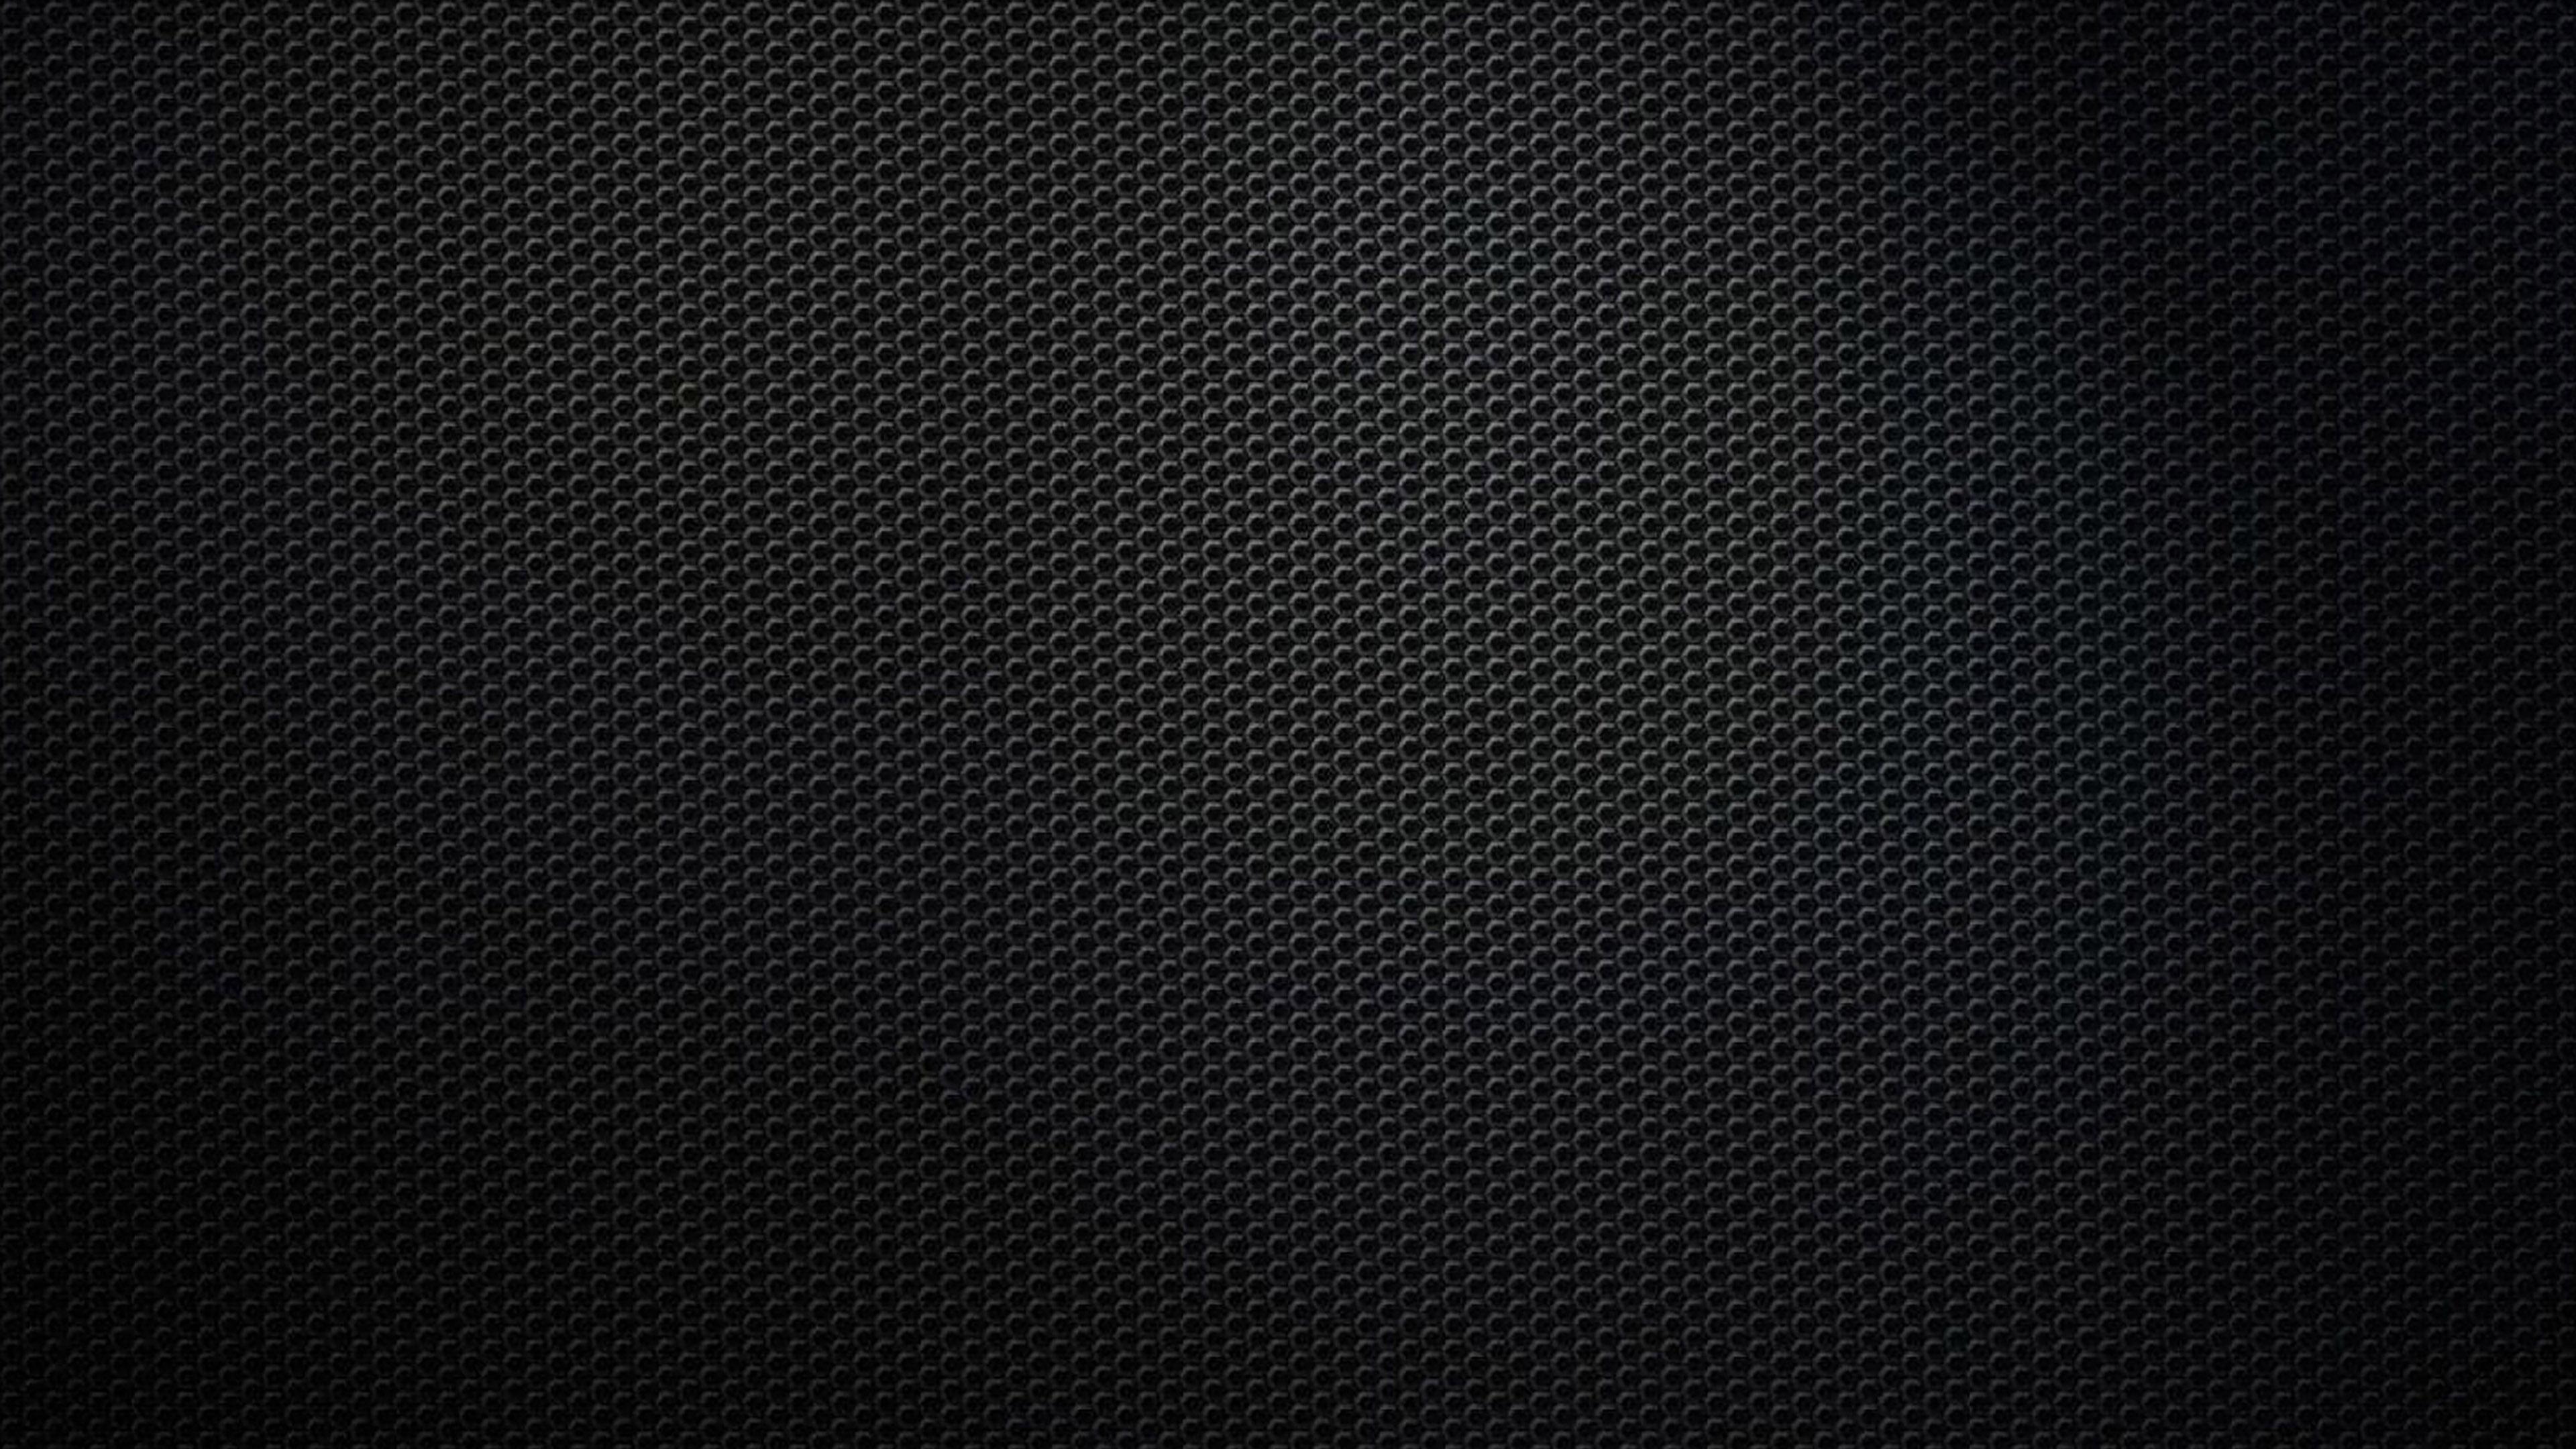 Carbon Fibre Iphone X Wallpaper I Love Papers Va43 Carbon Pattern Black Pattern